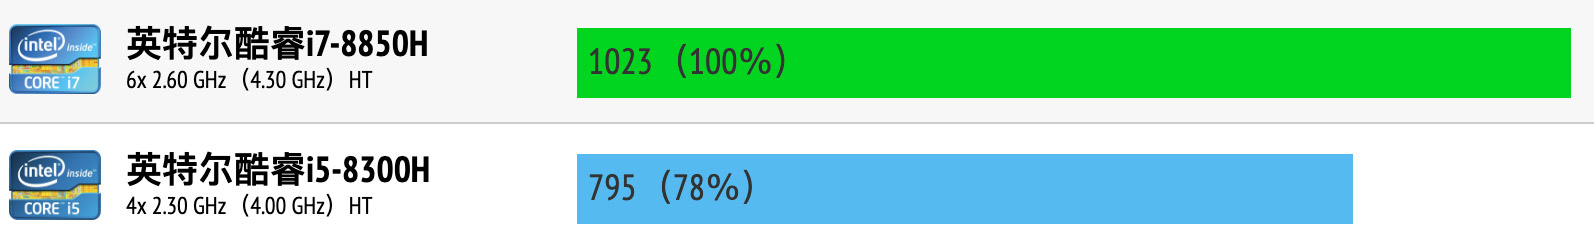 Intel Core i7-8850H和i5-8300H性能跑分对比评测